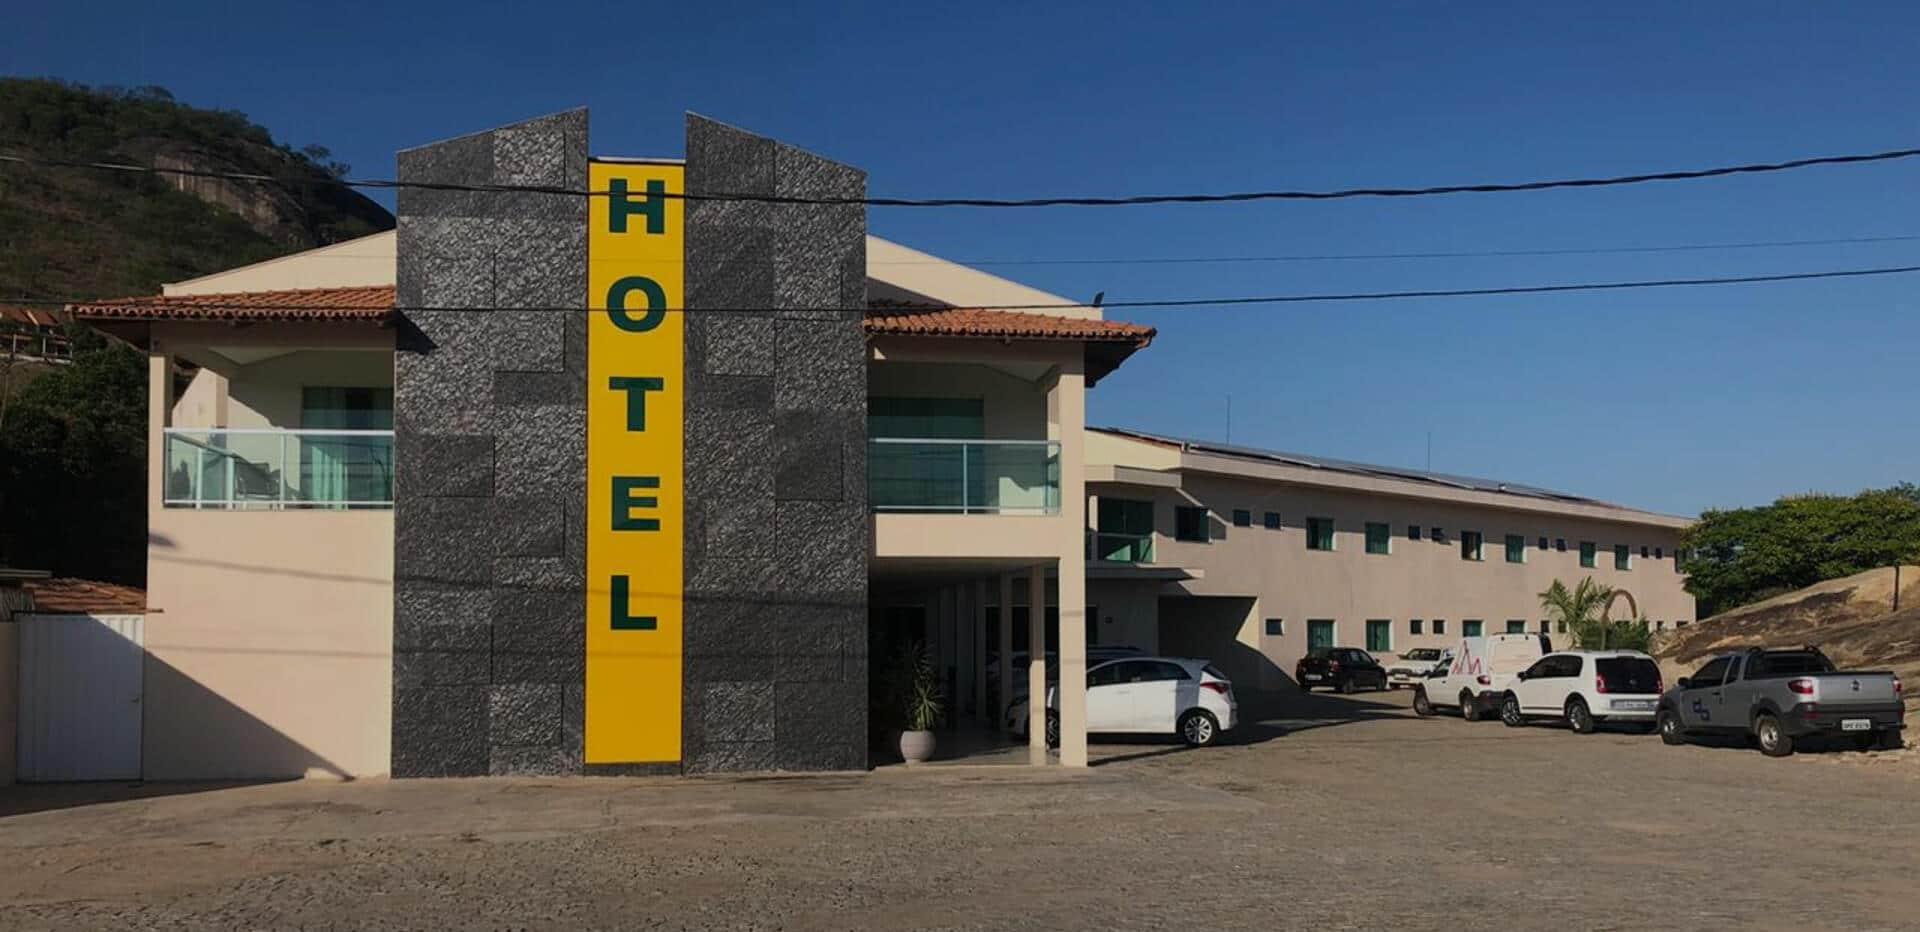 Fachada do Jequitiara Hotel em Itaobim MG